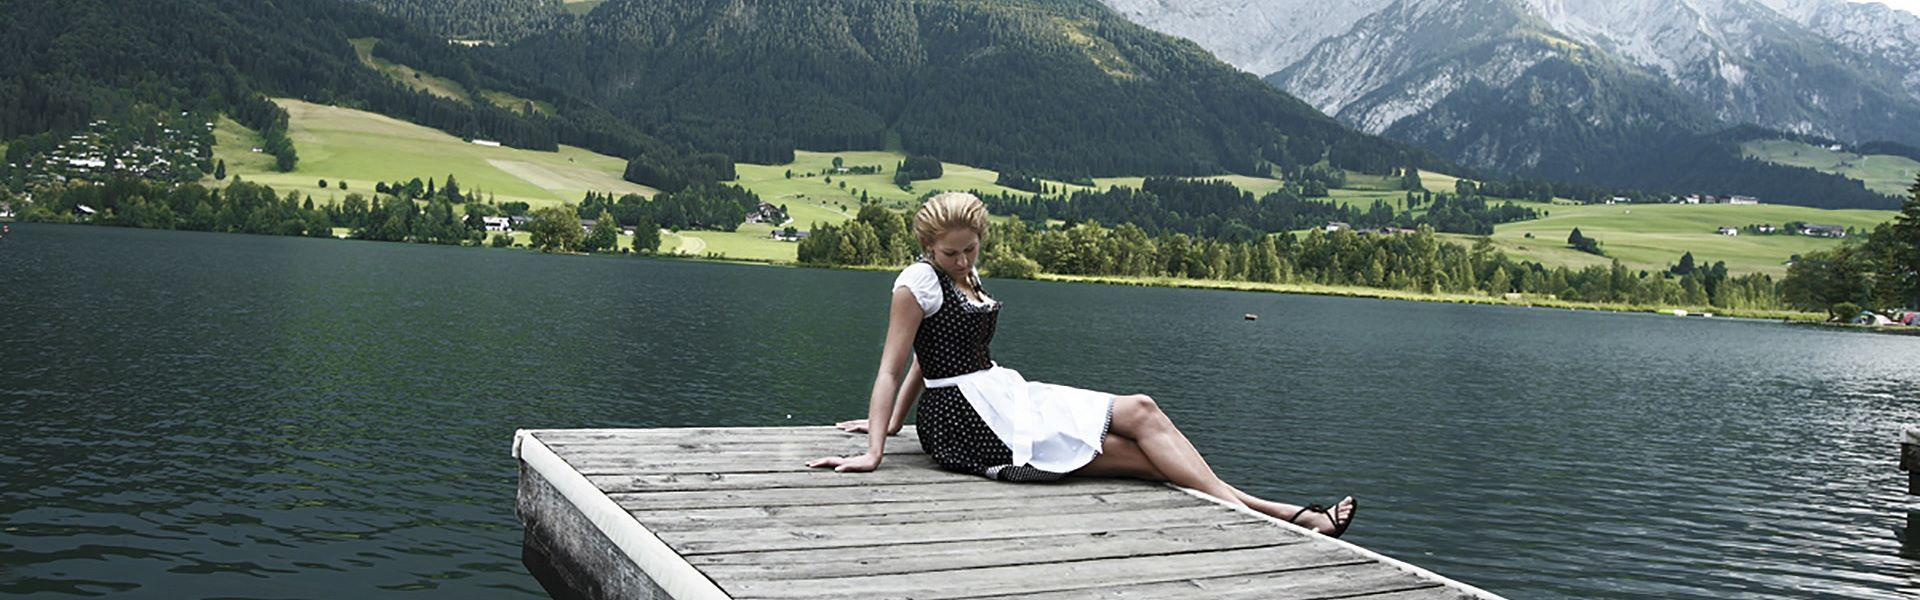 Speed Dating sterreich Ebbs, Austria Singles Kitzbuhel